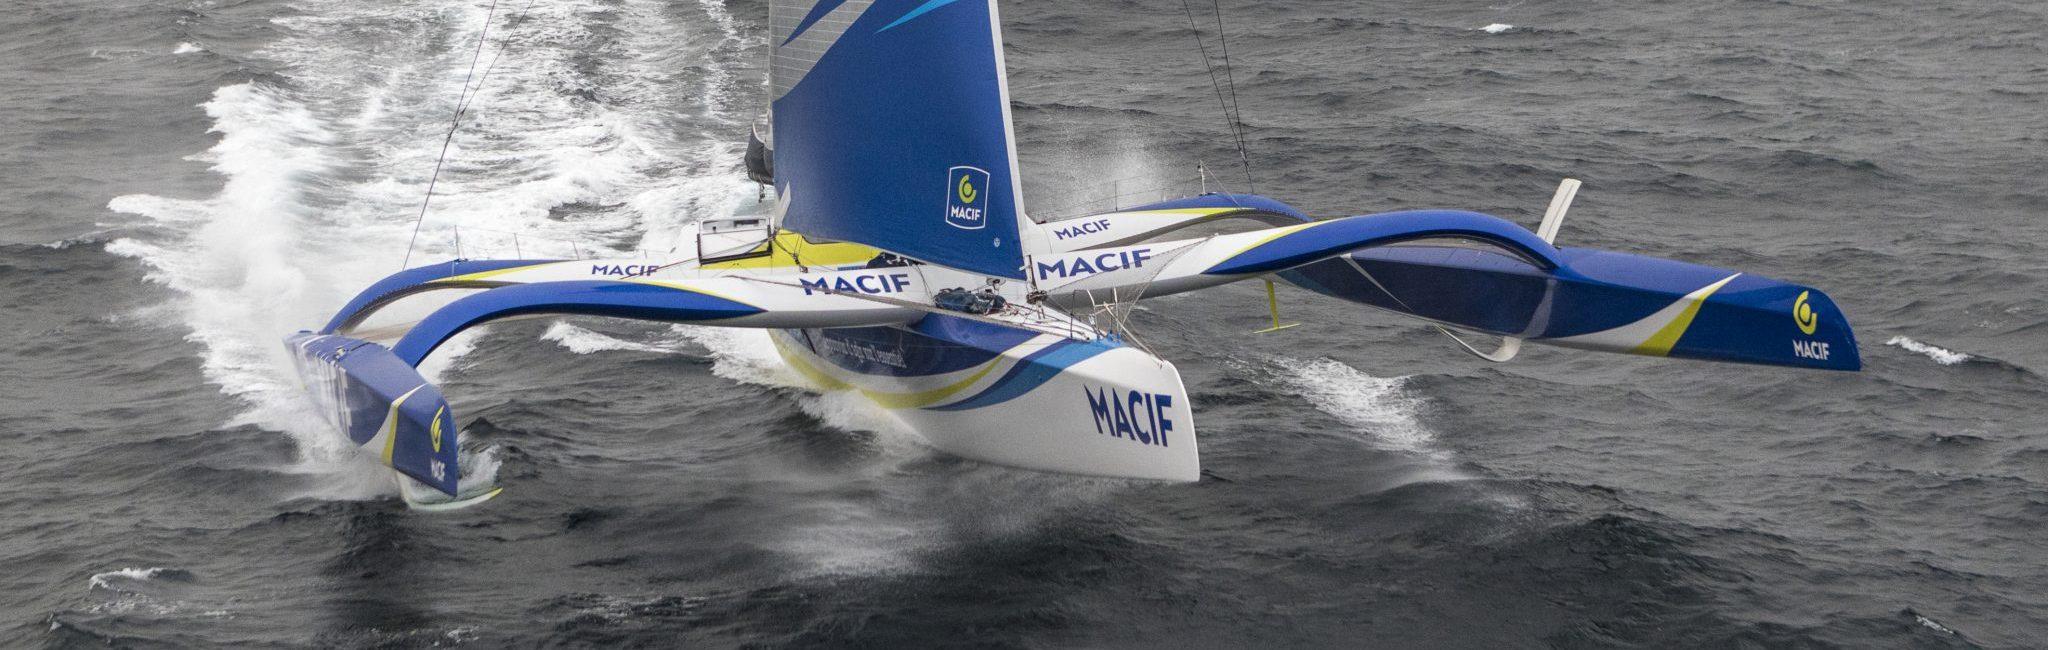 MACIF_aerial_026-2048x650.jpg